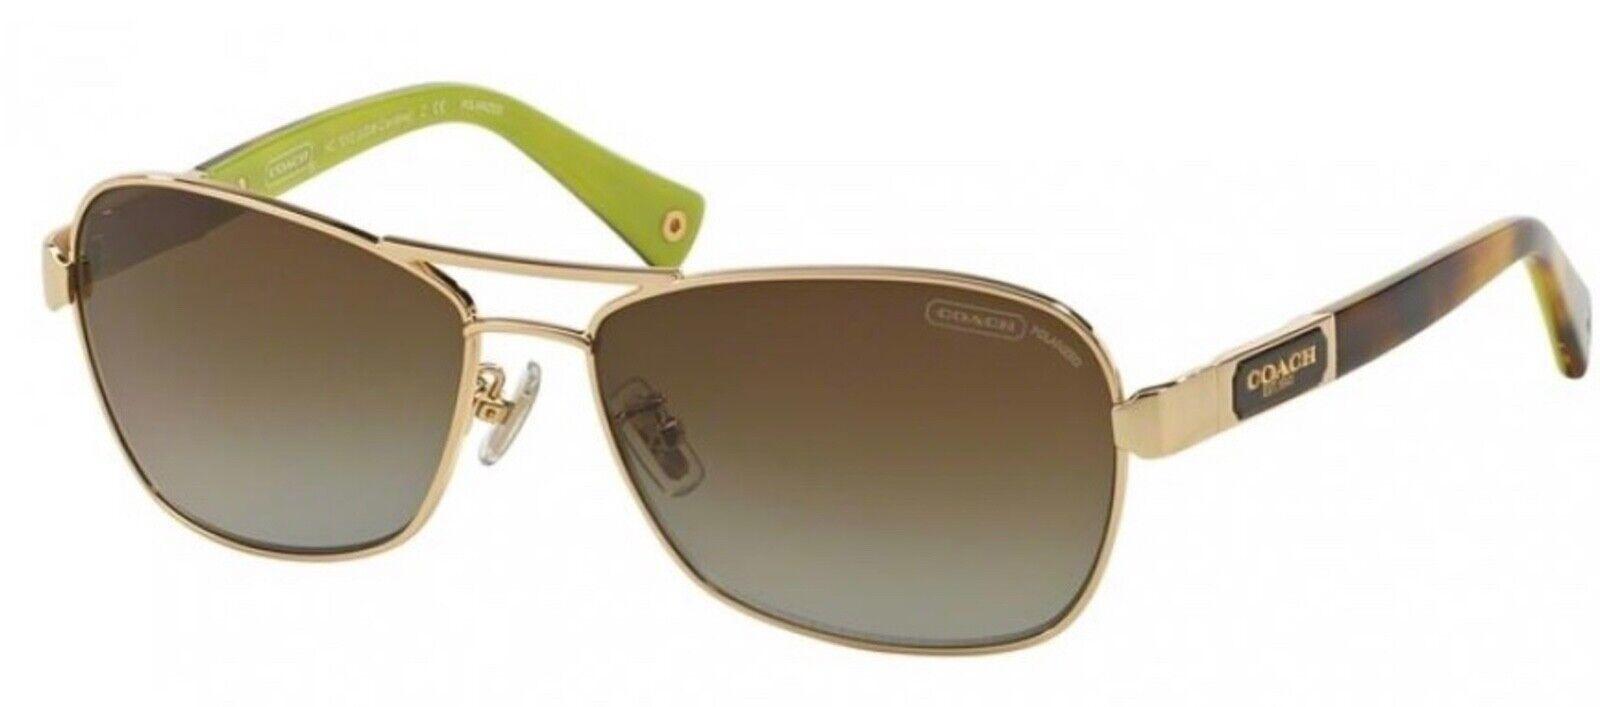 ~COACH~ HC 7012 SUNGLASSES Gold & Light Tortoise 🕶 NEW Metal Caroline